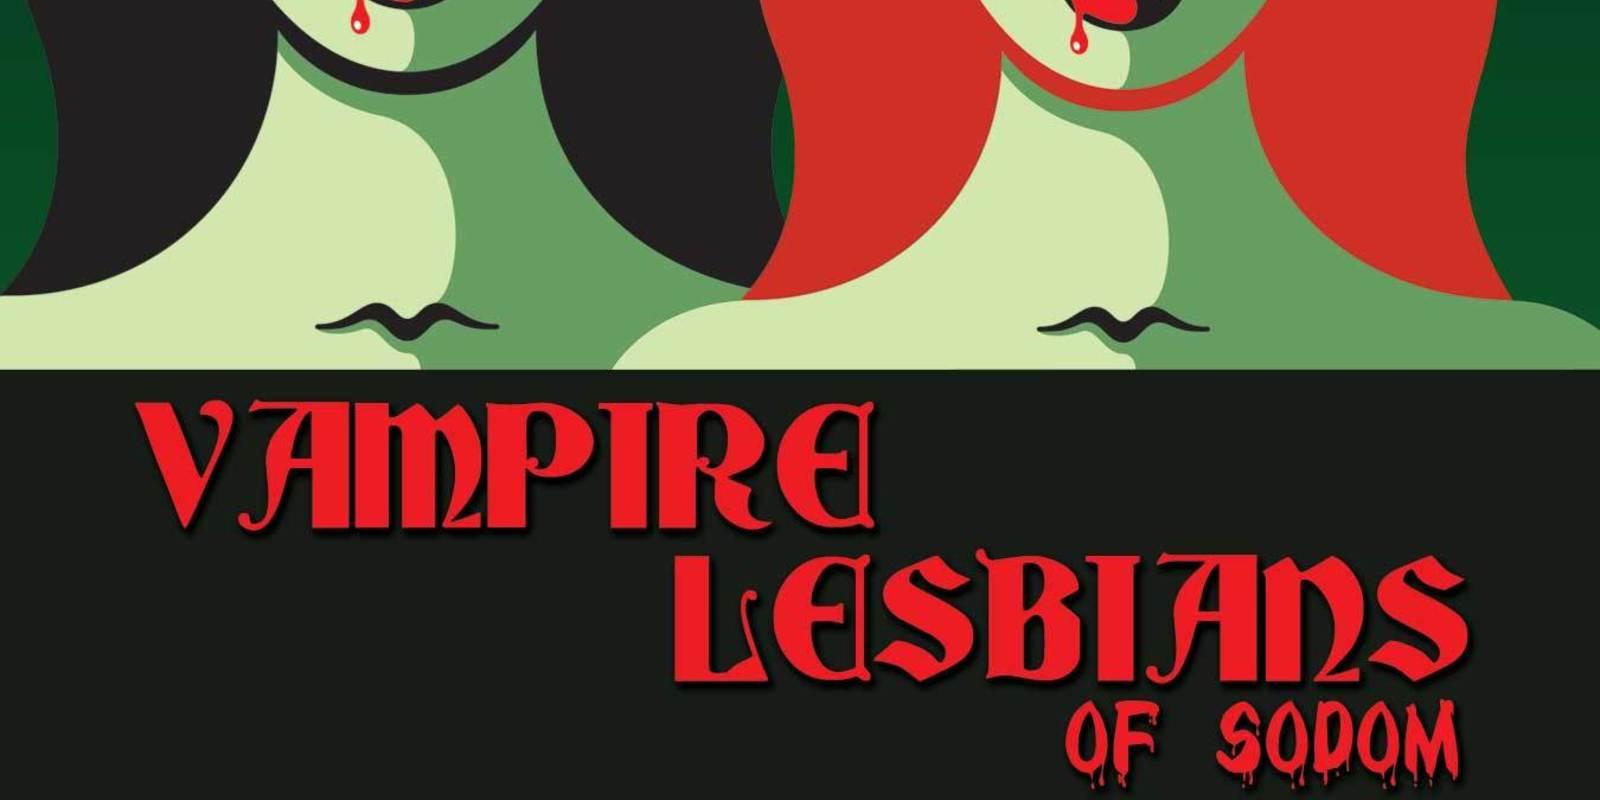 Vampire Lesbians of Sodom by Charles Busch